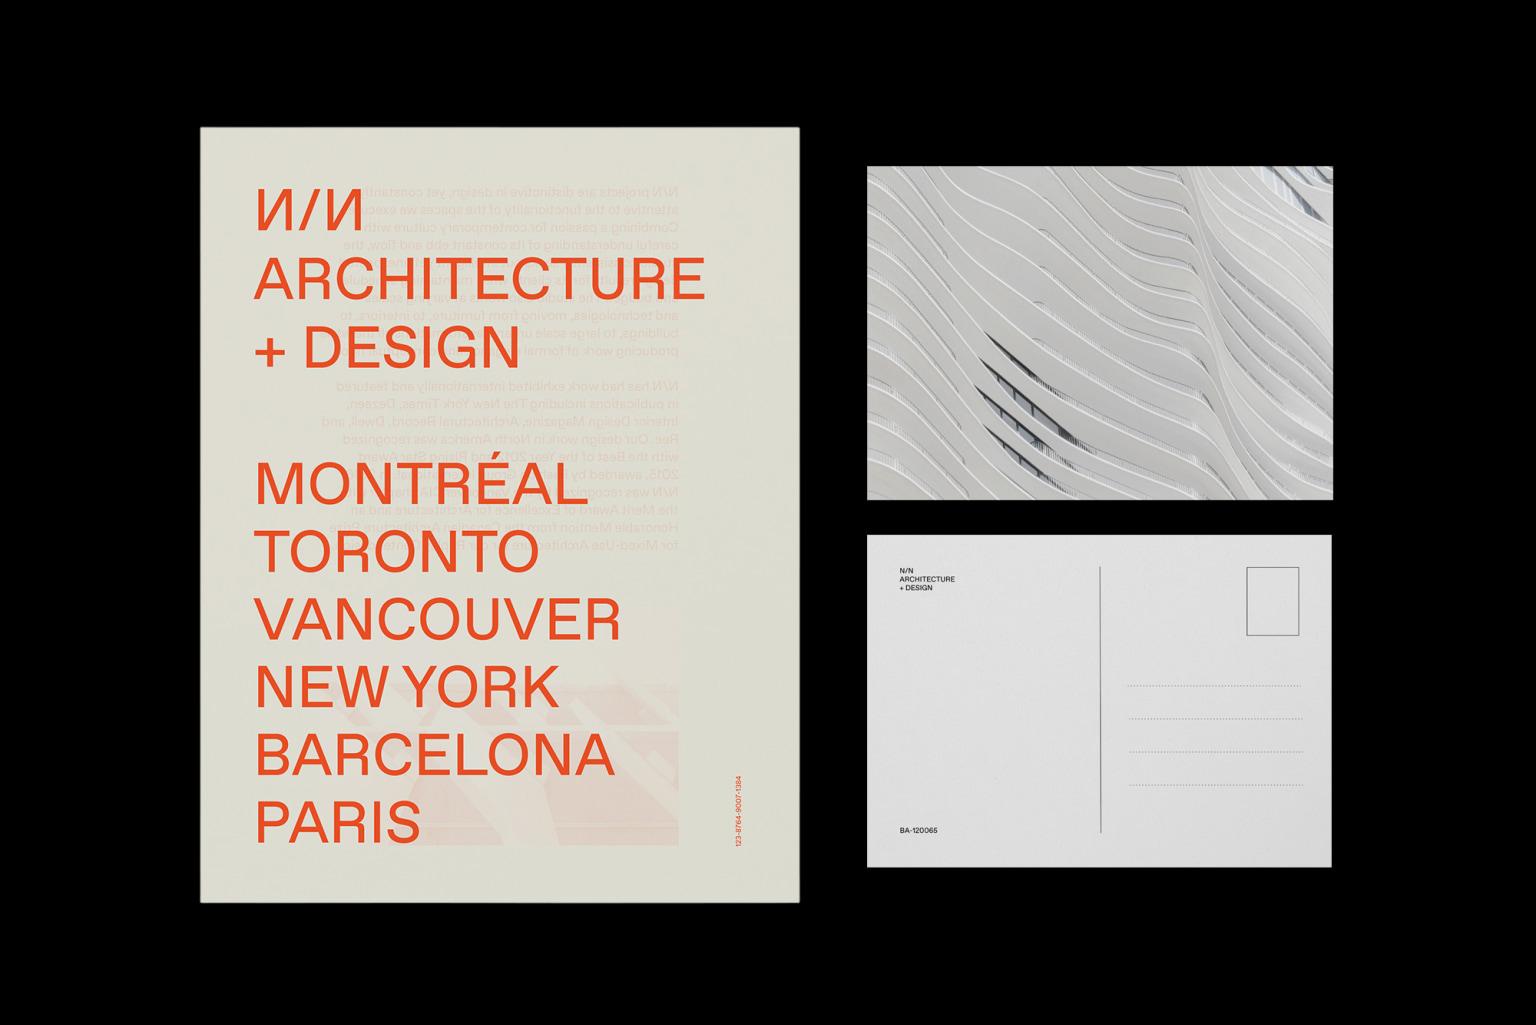 N/N Architecture